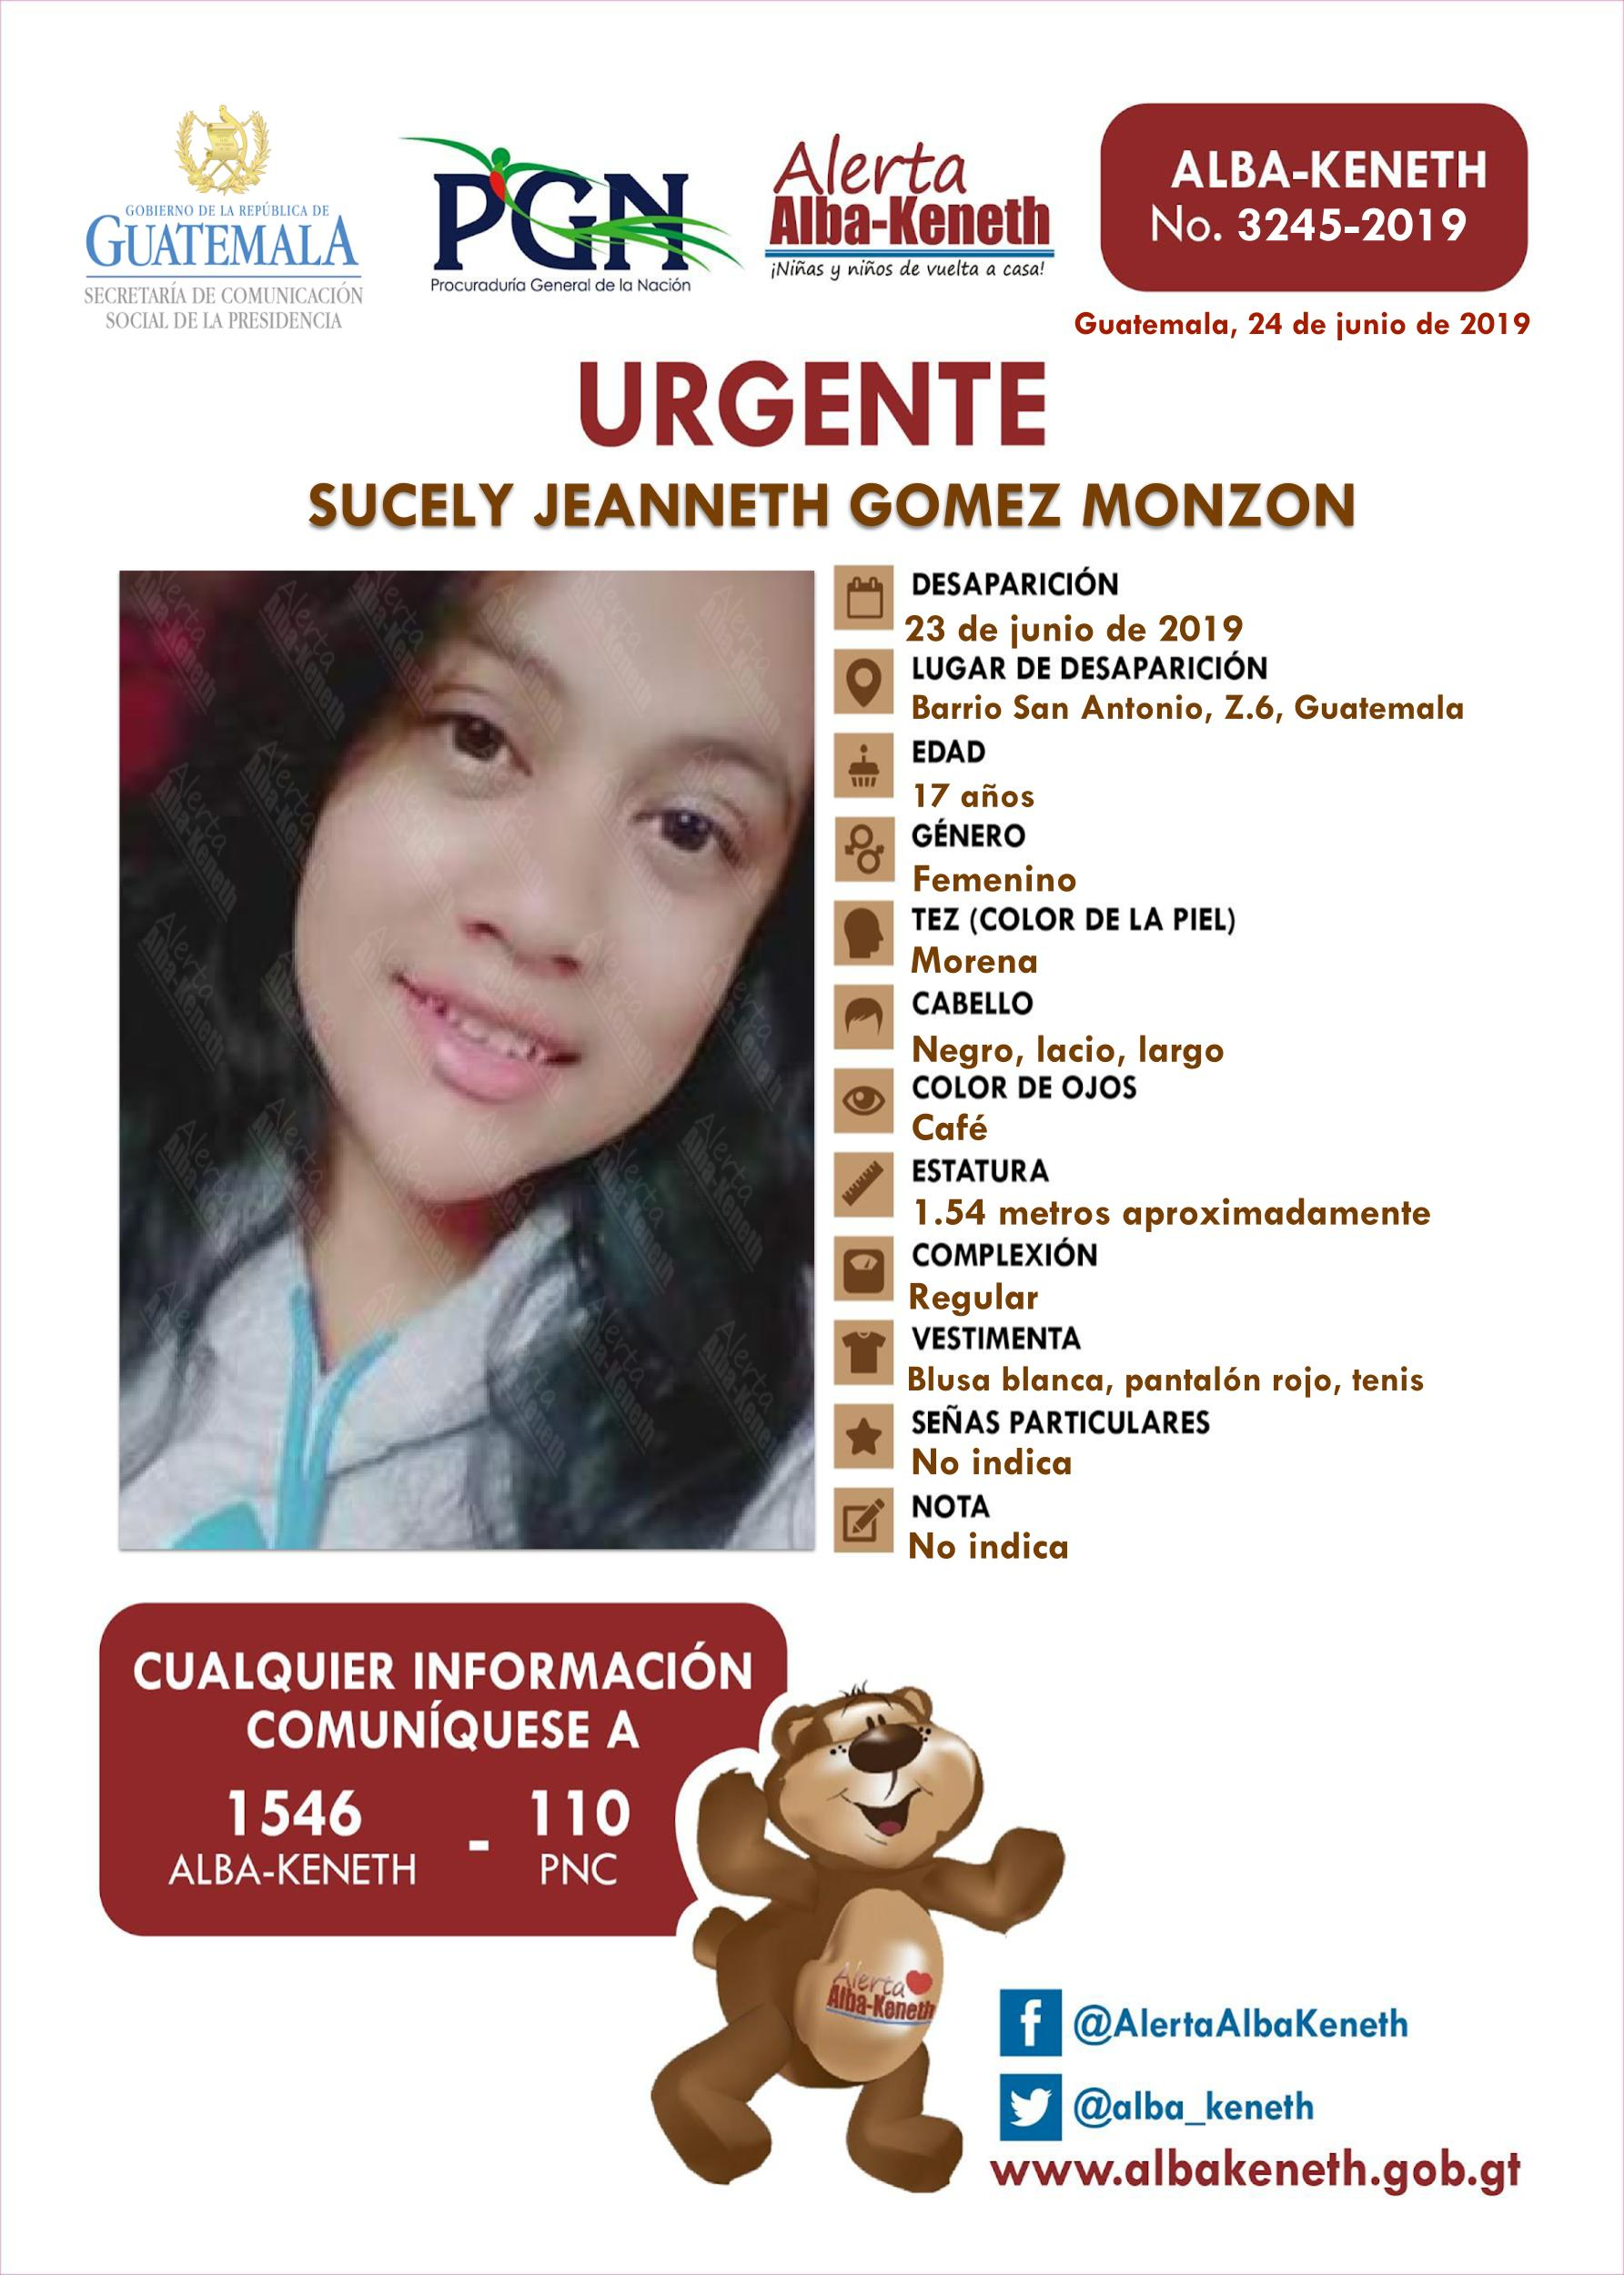 Sucely Jeanneth Gomez Monzon